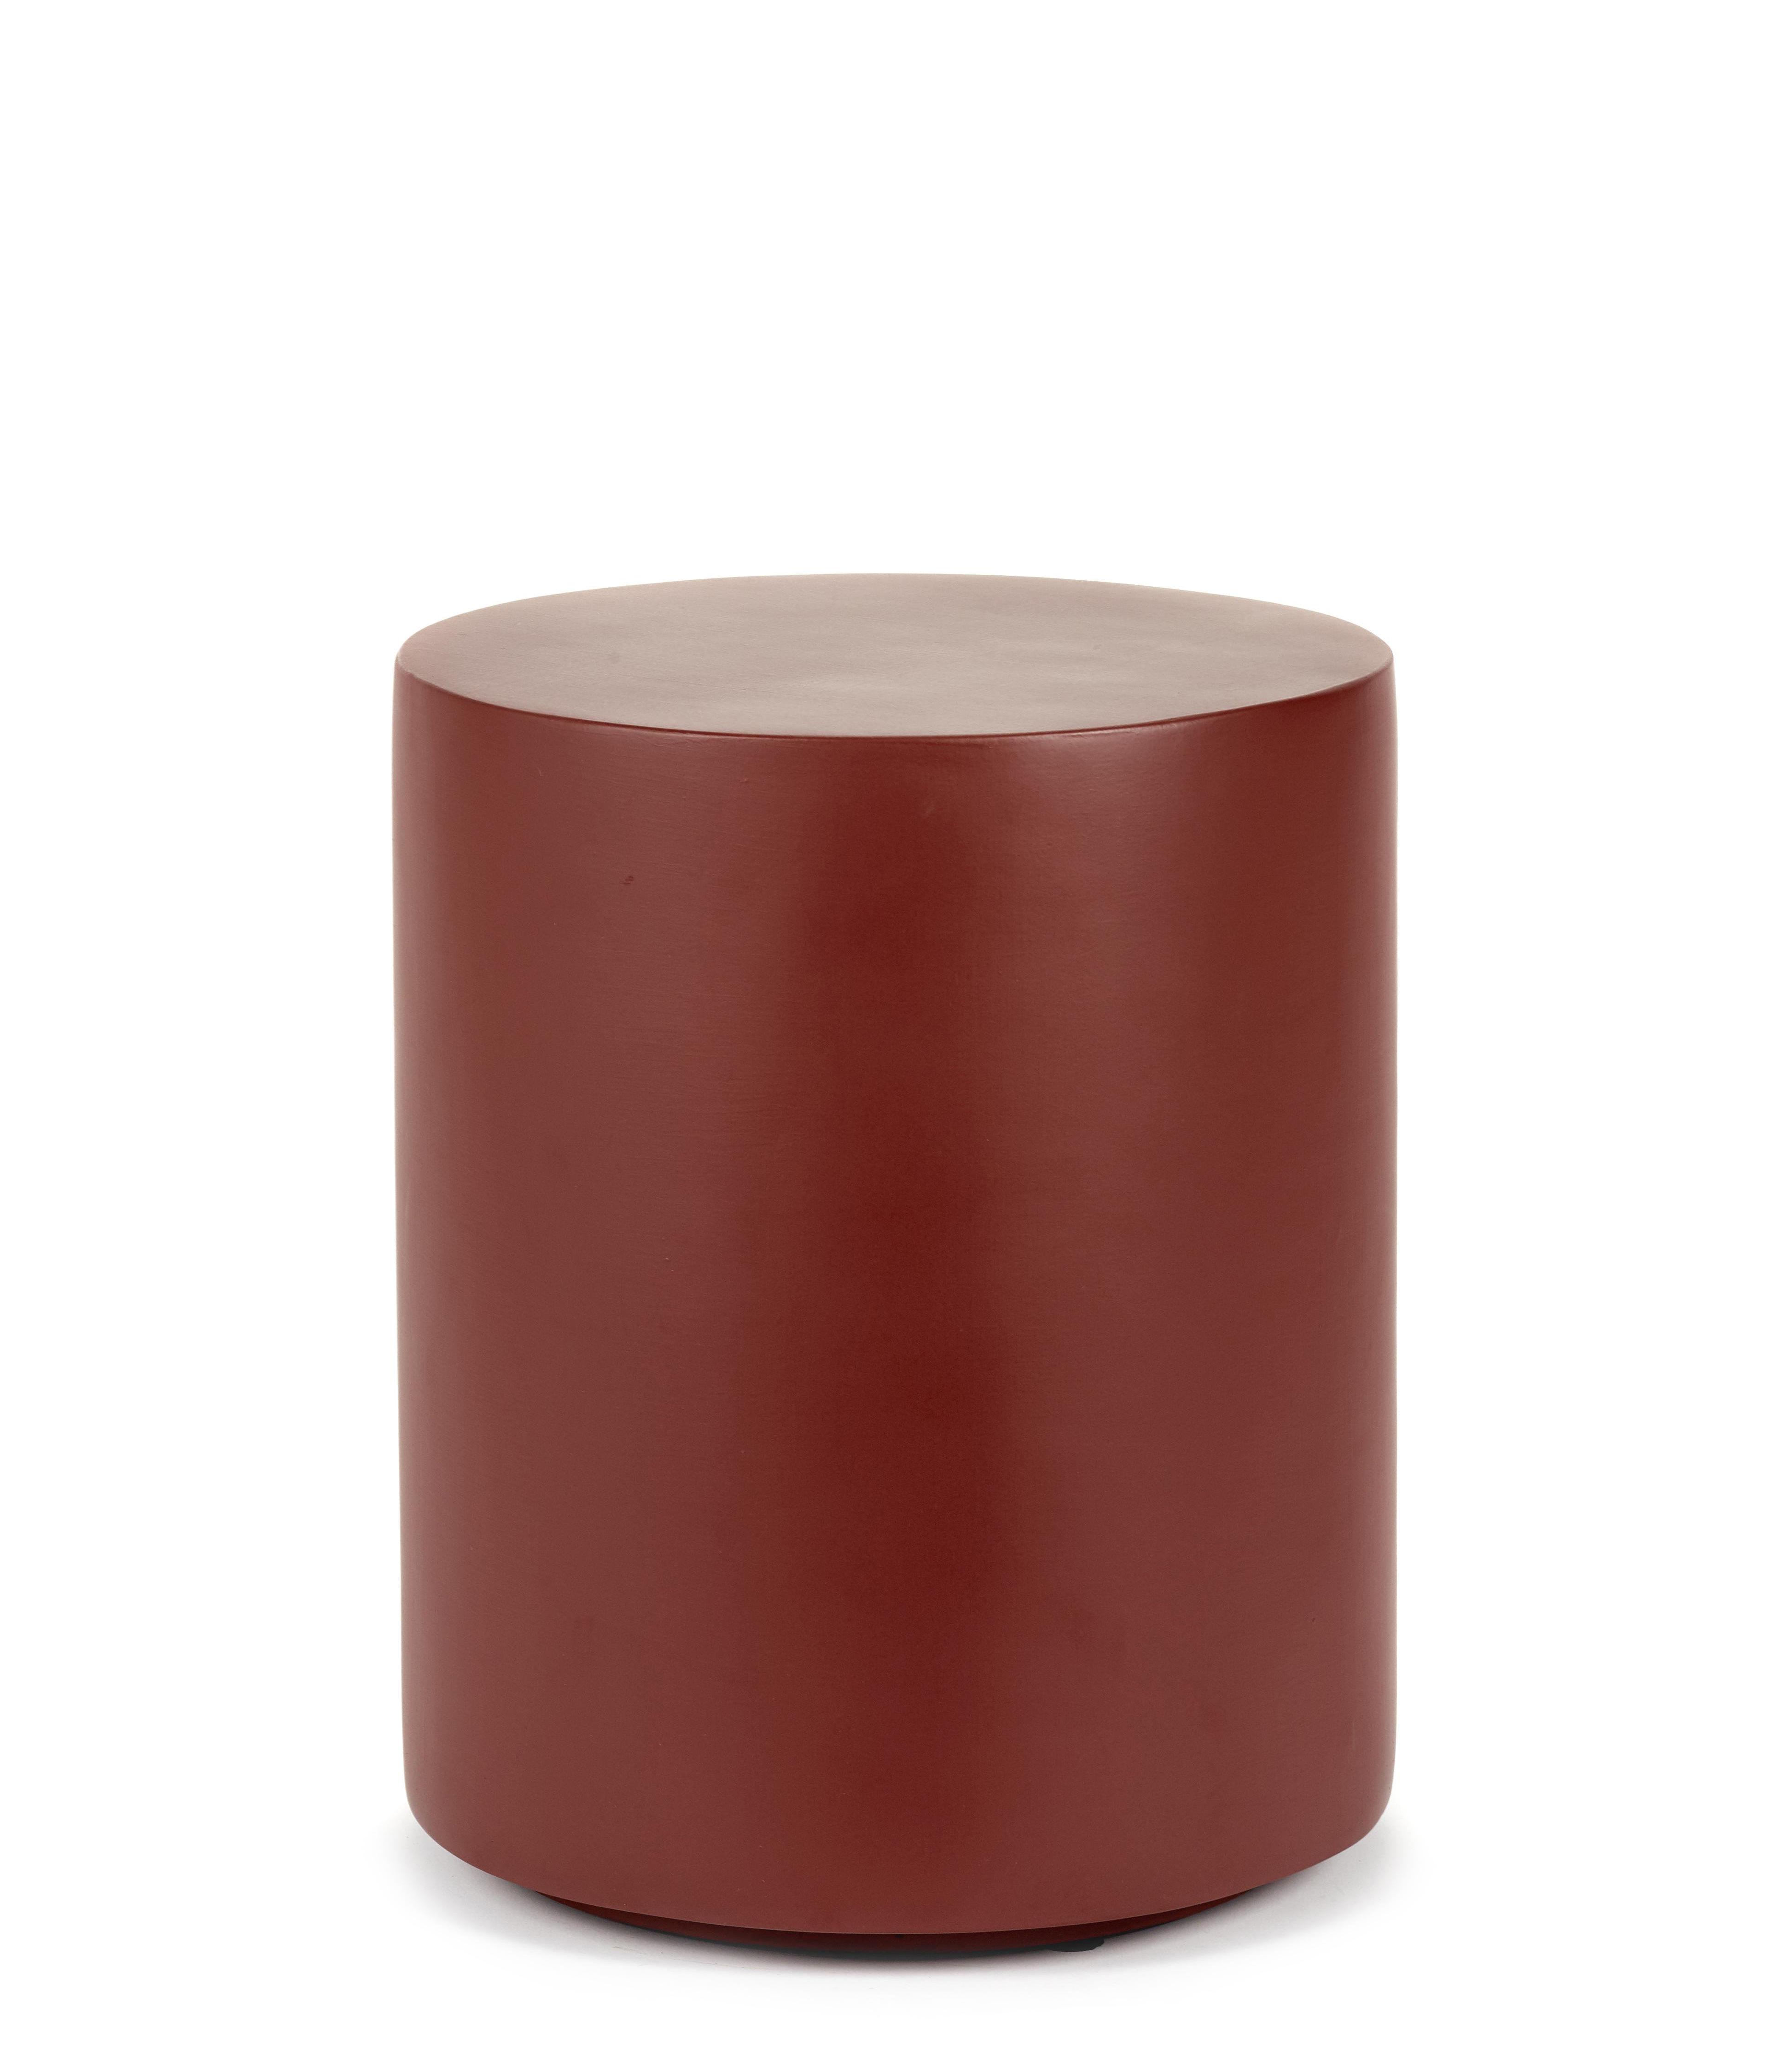 Mobilier - Tables basses - Table d'appoint Pawn / Tabouret - Ø 30 x H 36 cm - Fibre polyester - Serax - Rouge - Fibre polyester peinte